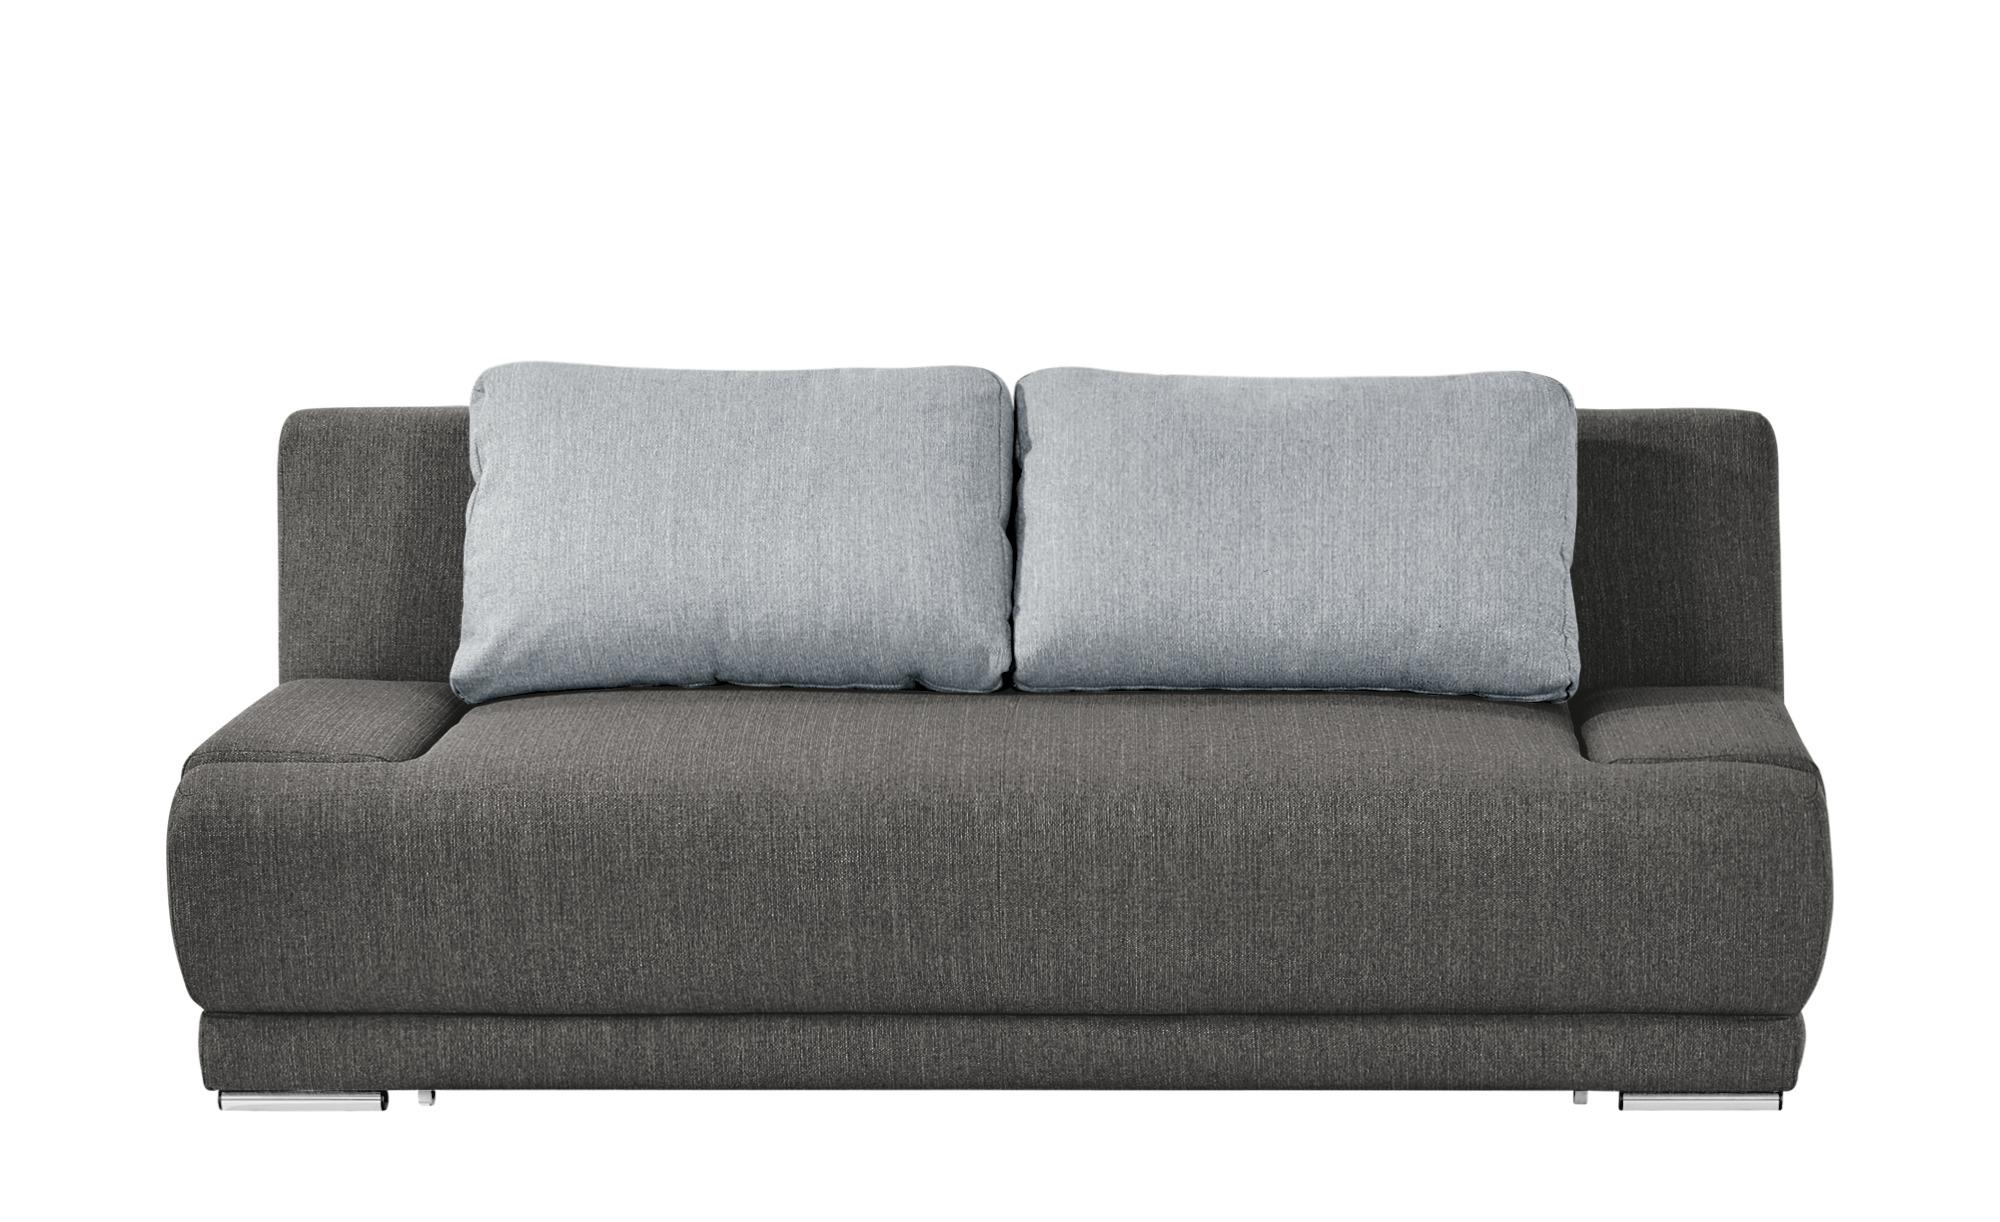 smart Schlafsofa dunkelgrau/grau - Webstoff Regina ¦ grau ¦ Maße (cm): B: 206 H: 83 T: 98 Polstermöbel > Sofas > 2-Sitzer - Höffner